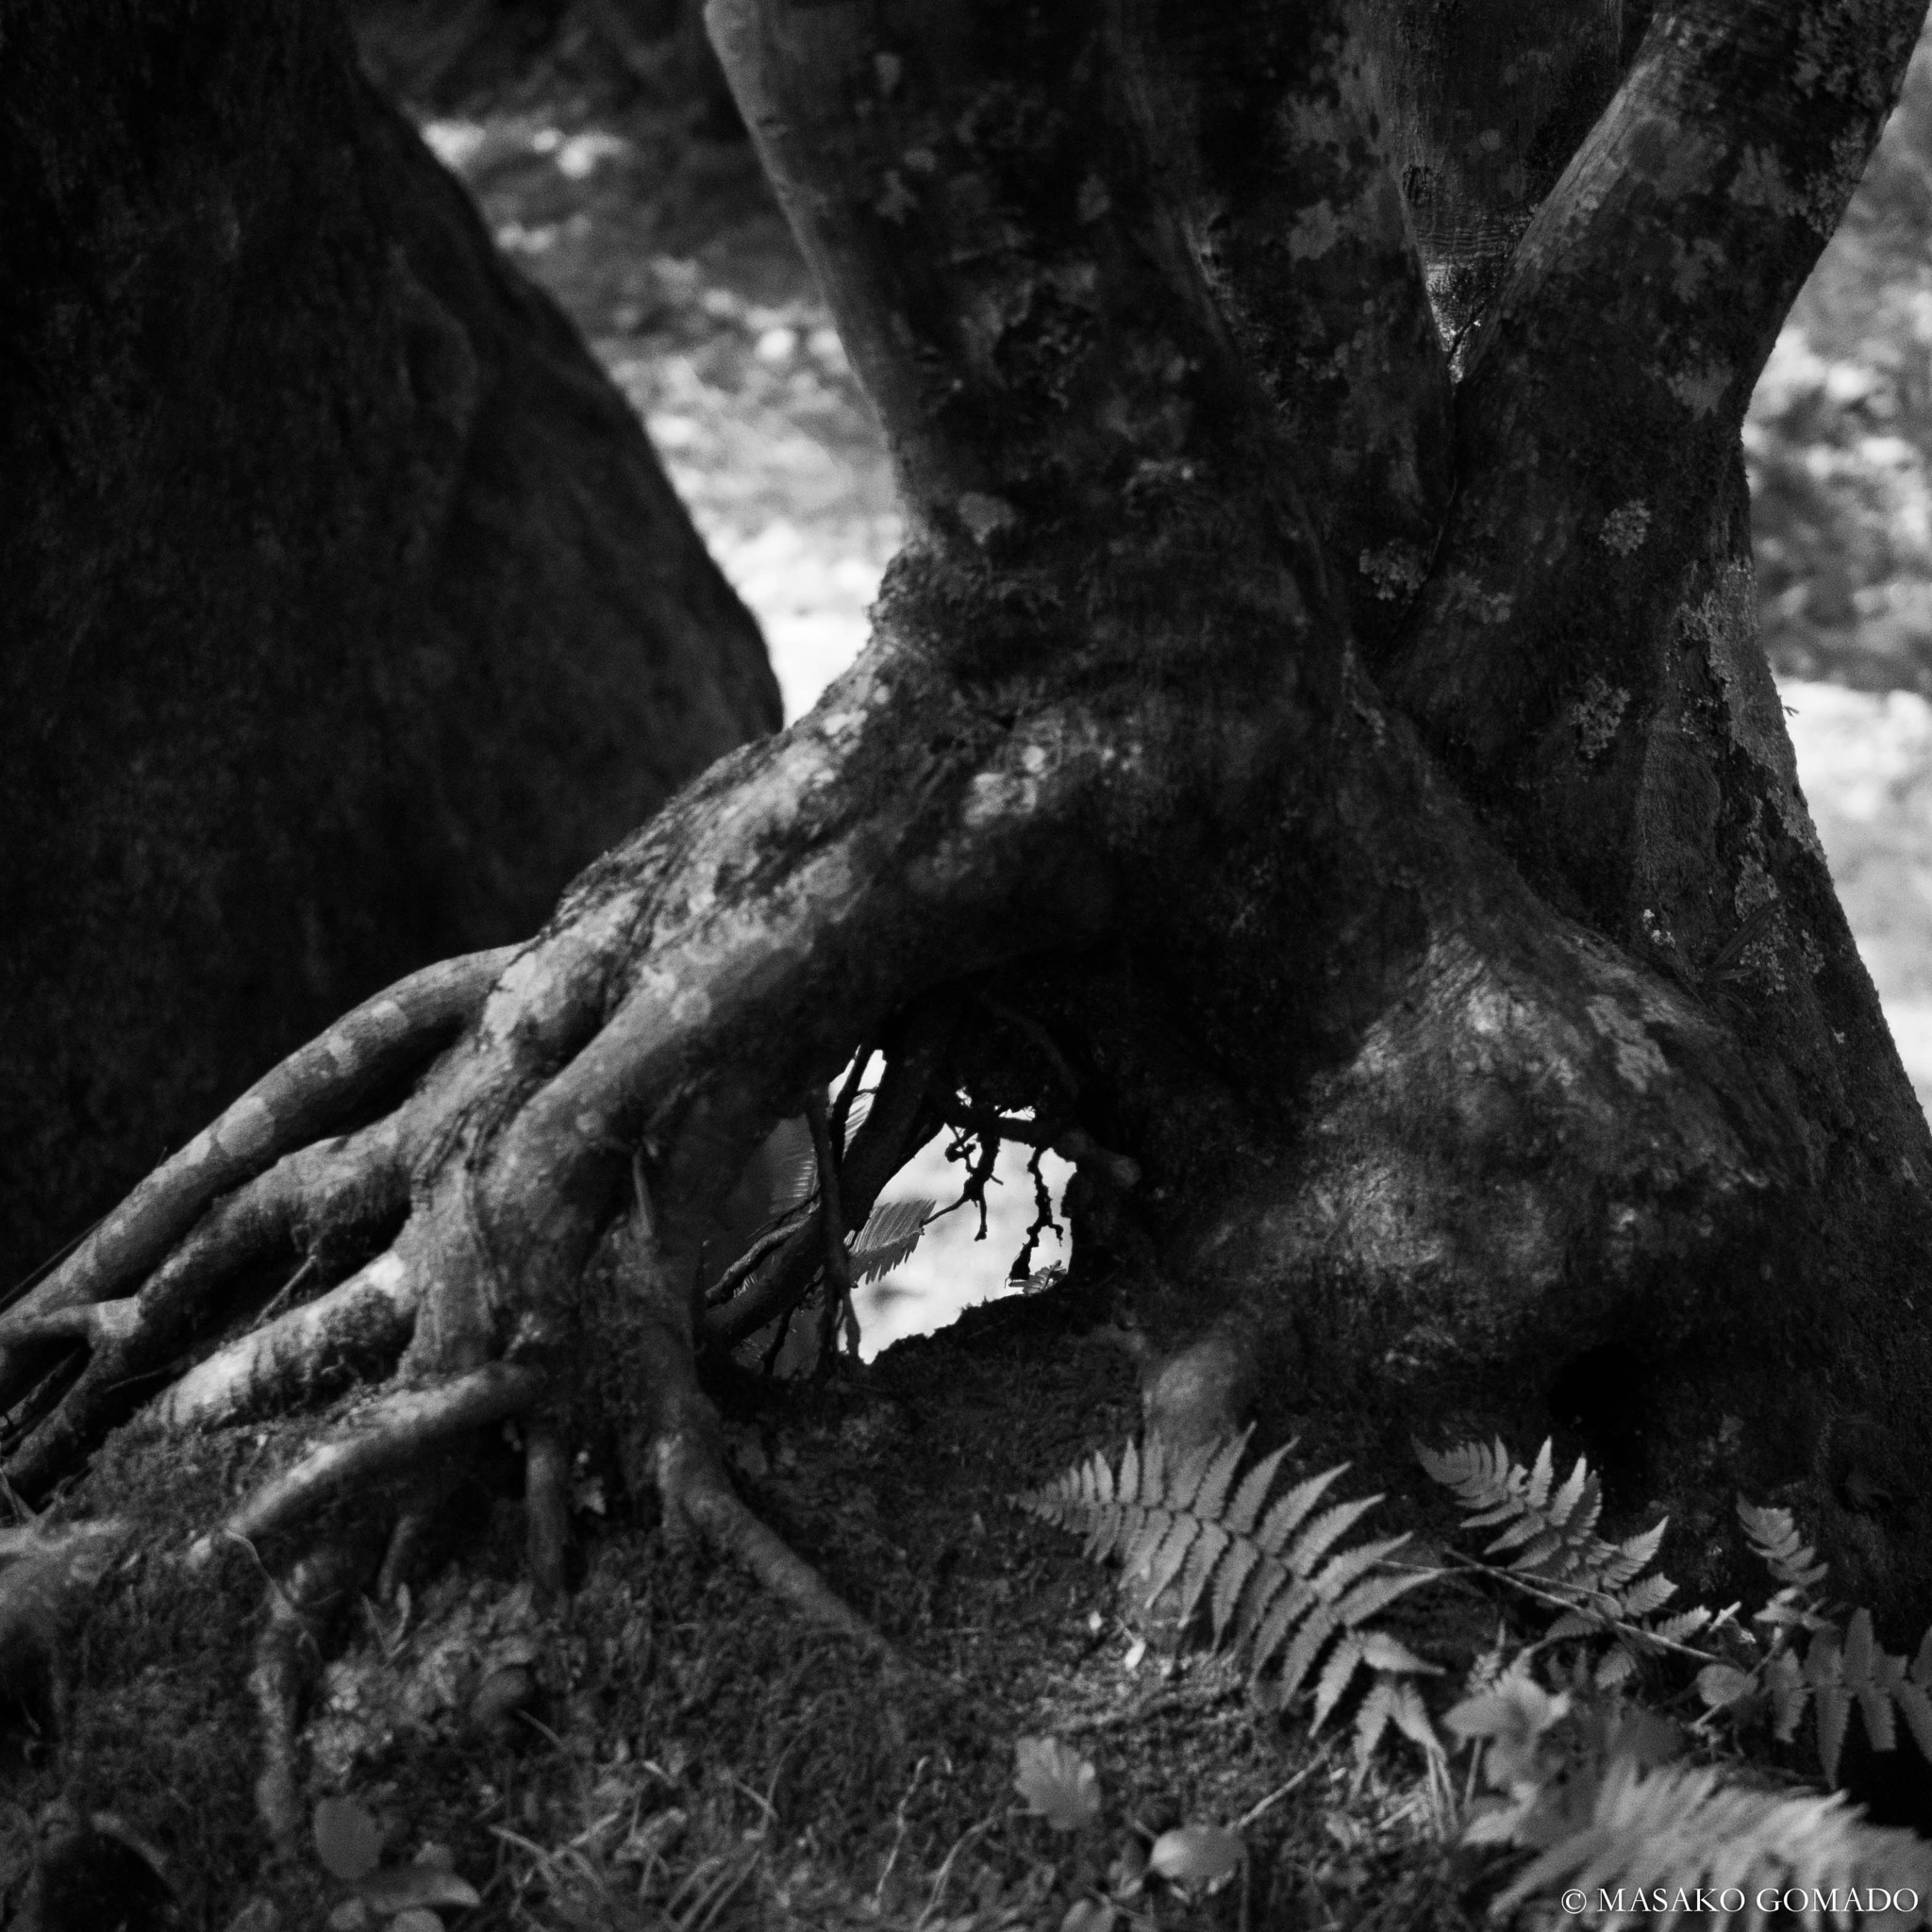 Root by Masako Gomado